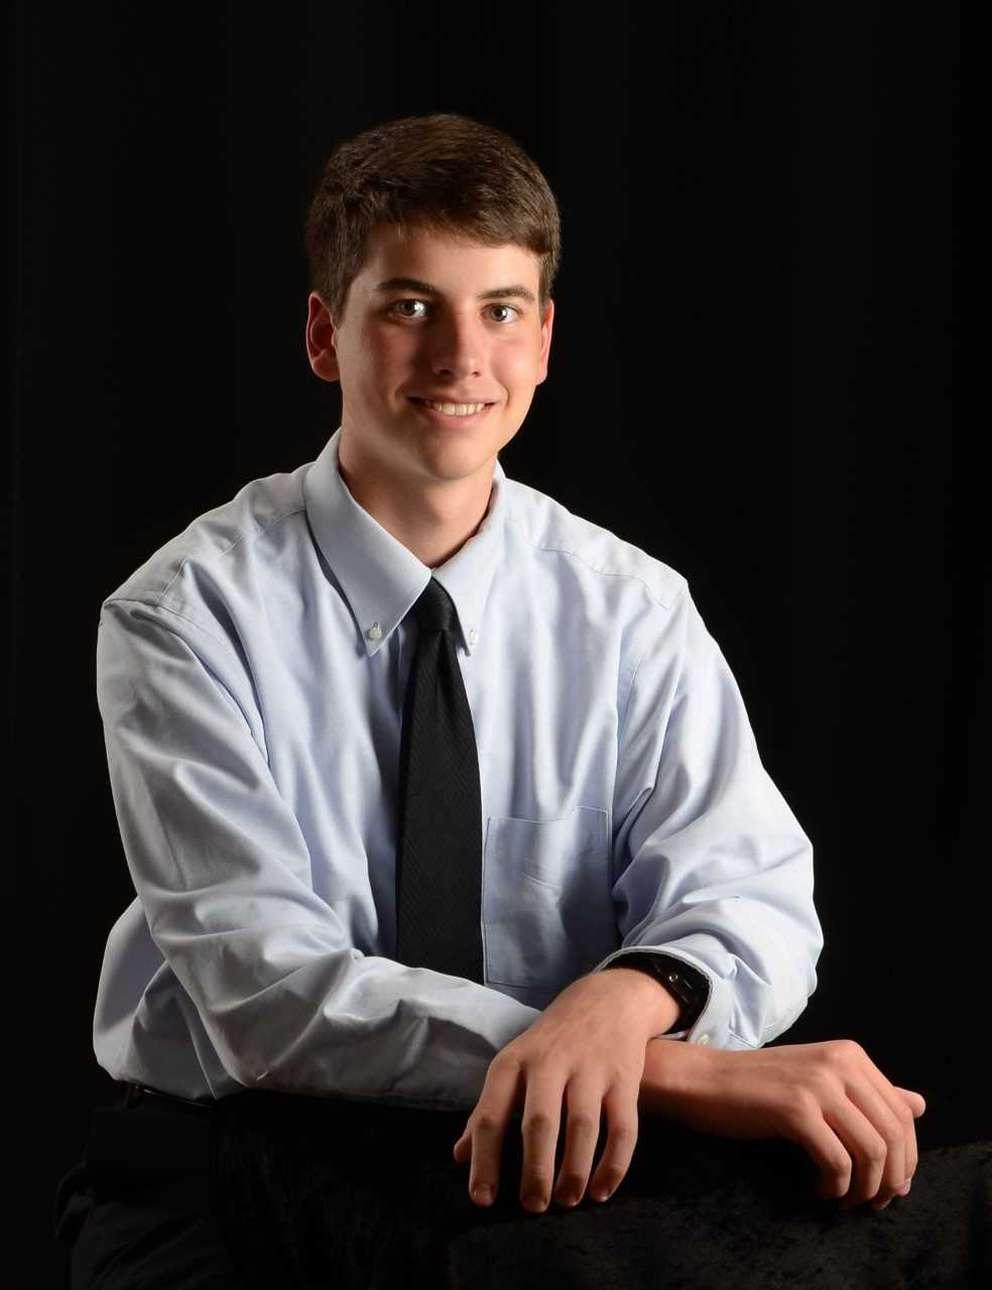 David Lawrence Polar is the 2018 salutatorian at Keswick Christian School.